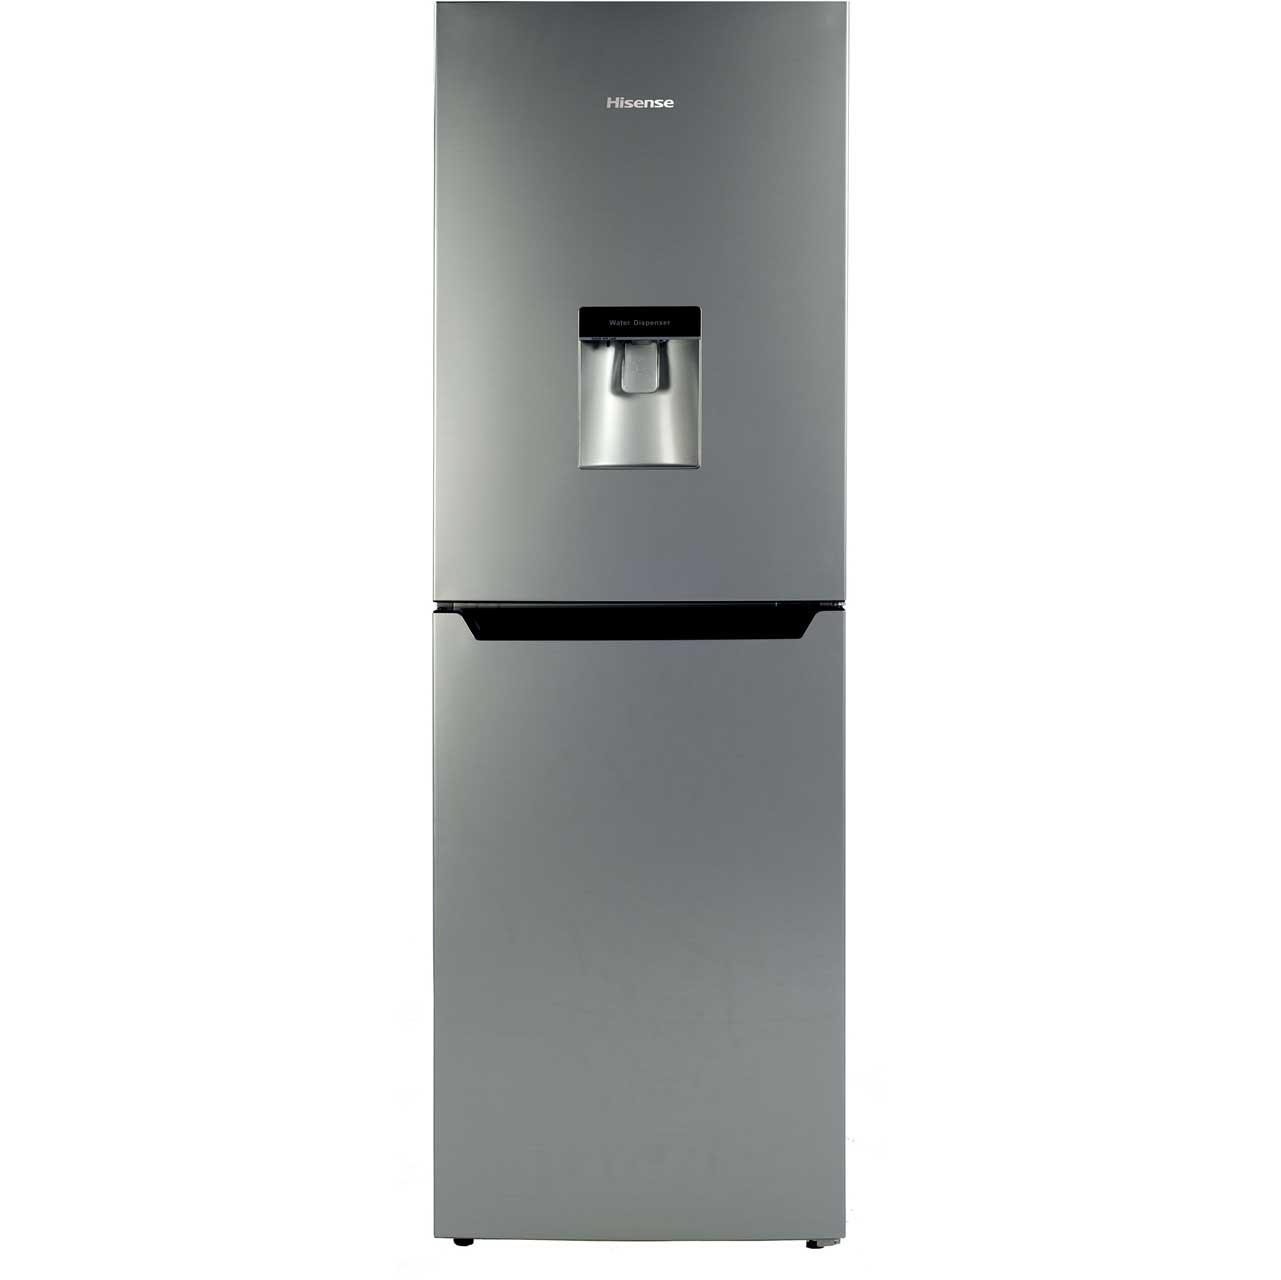 Hisense RB292F4WG1 Free Standing Fridge Freezer Frost Free in Silver